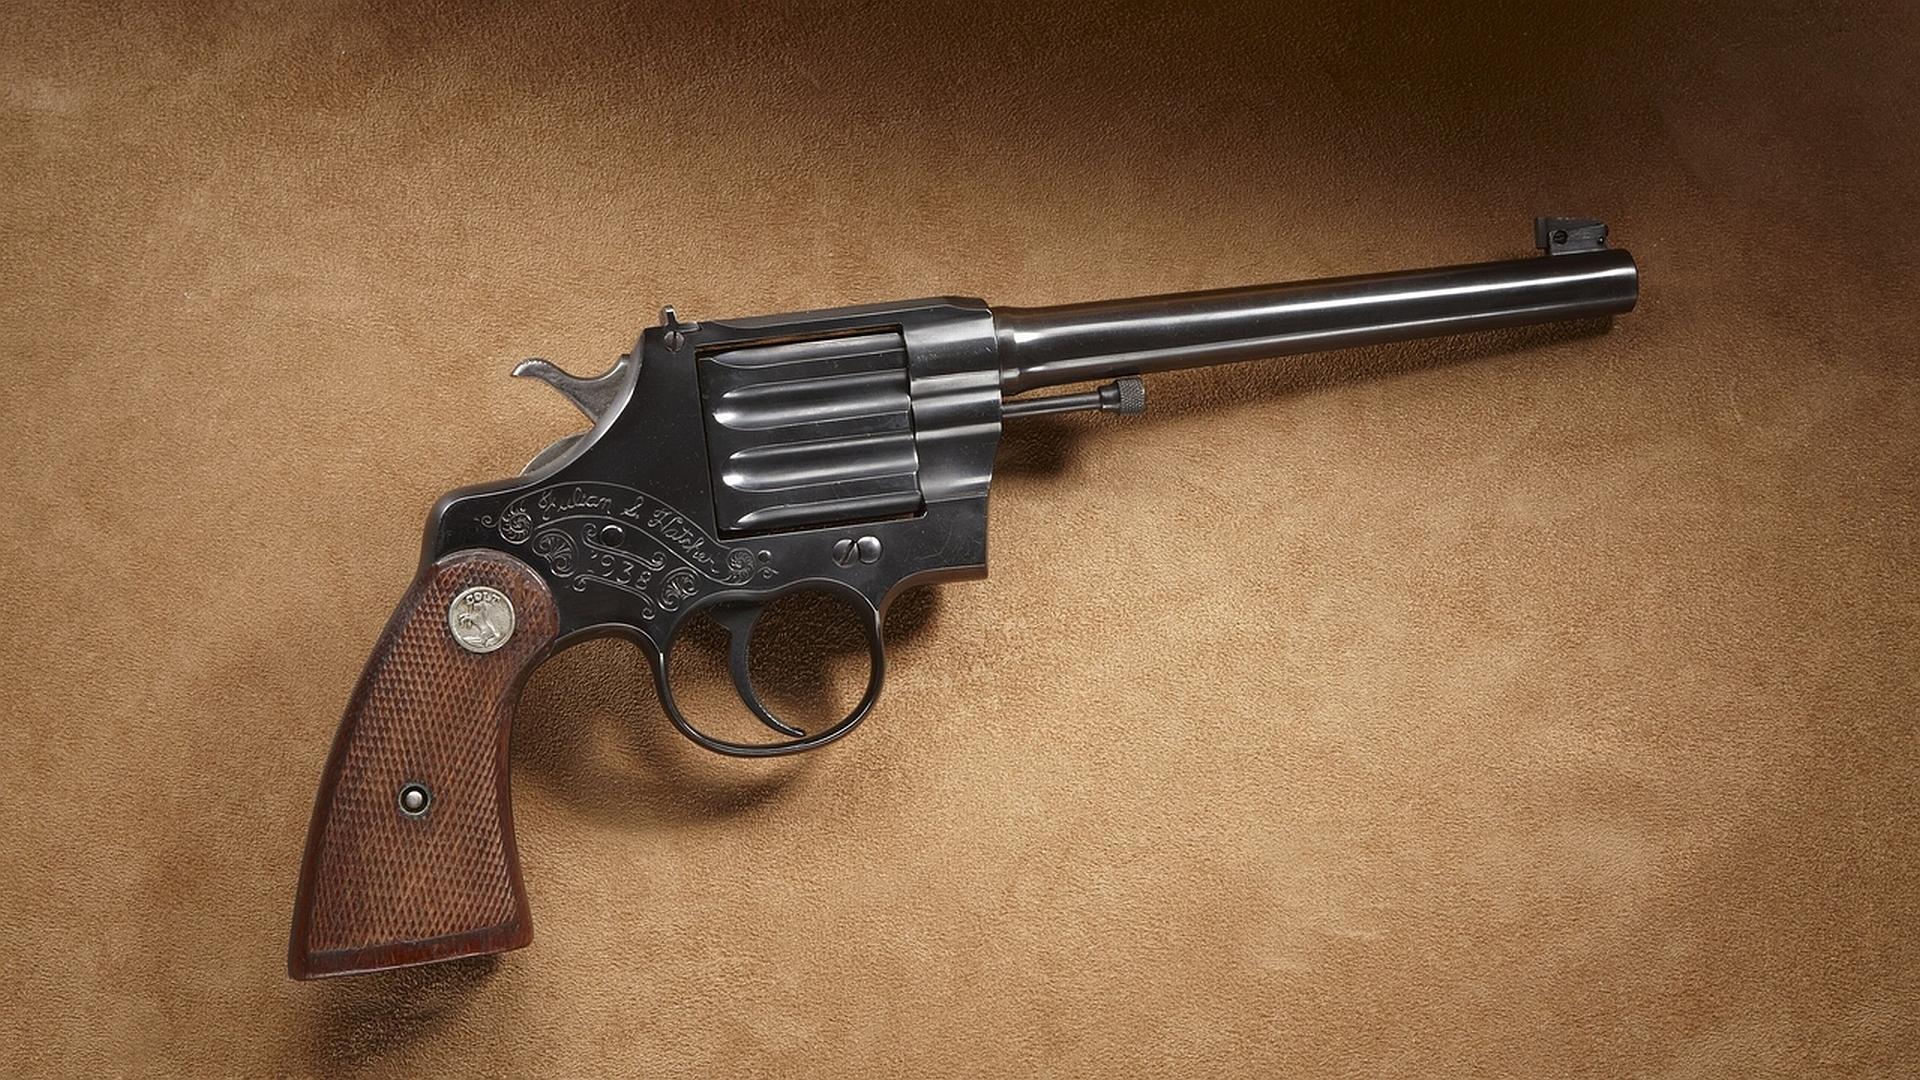 Wallpapers Oakley 3d Colt Revolver Hd Wallpaper Background Image 1920x1080